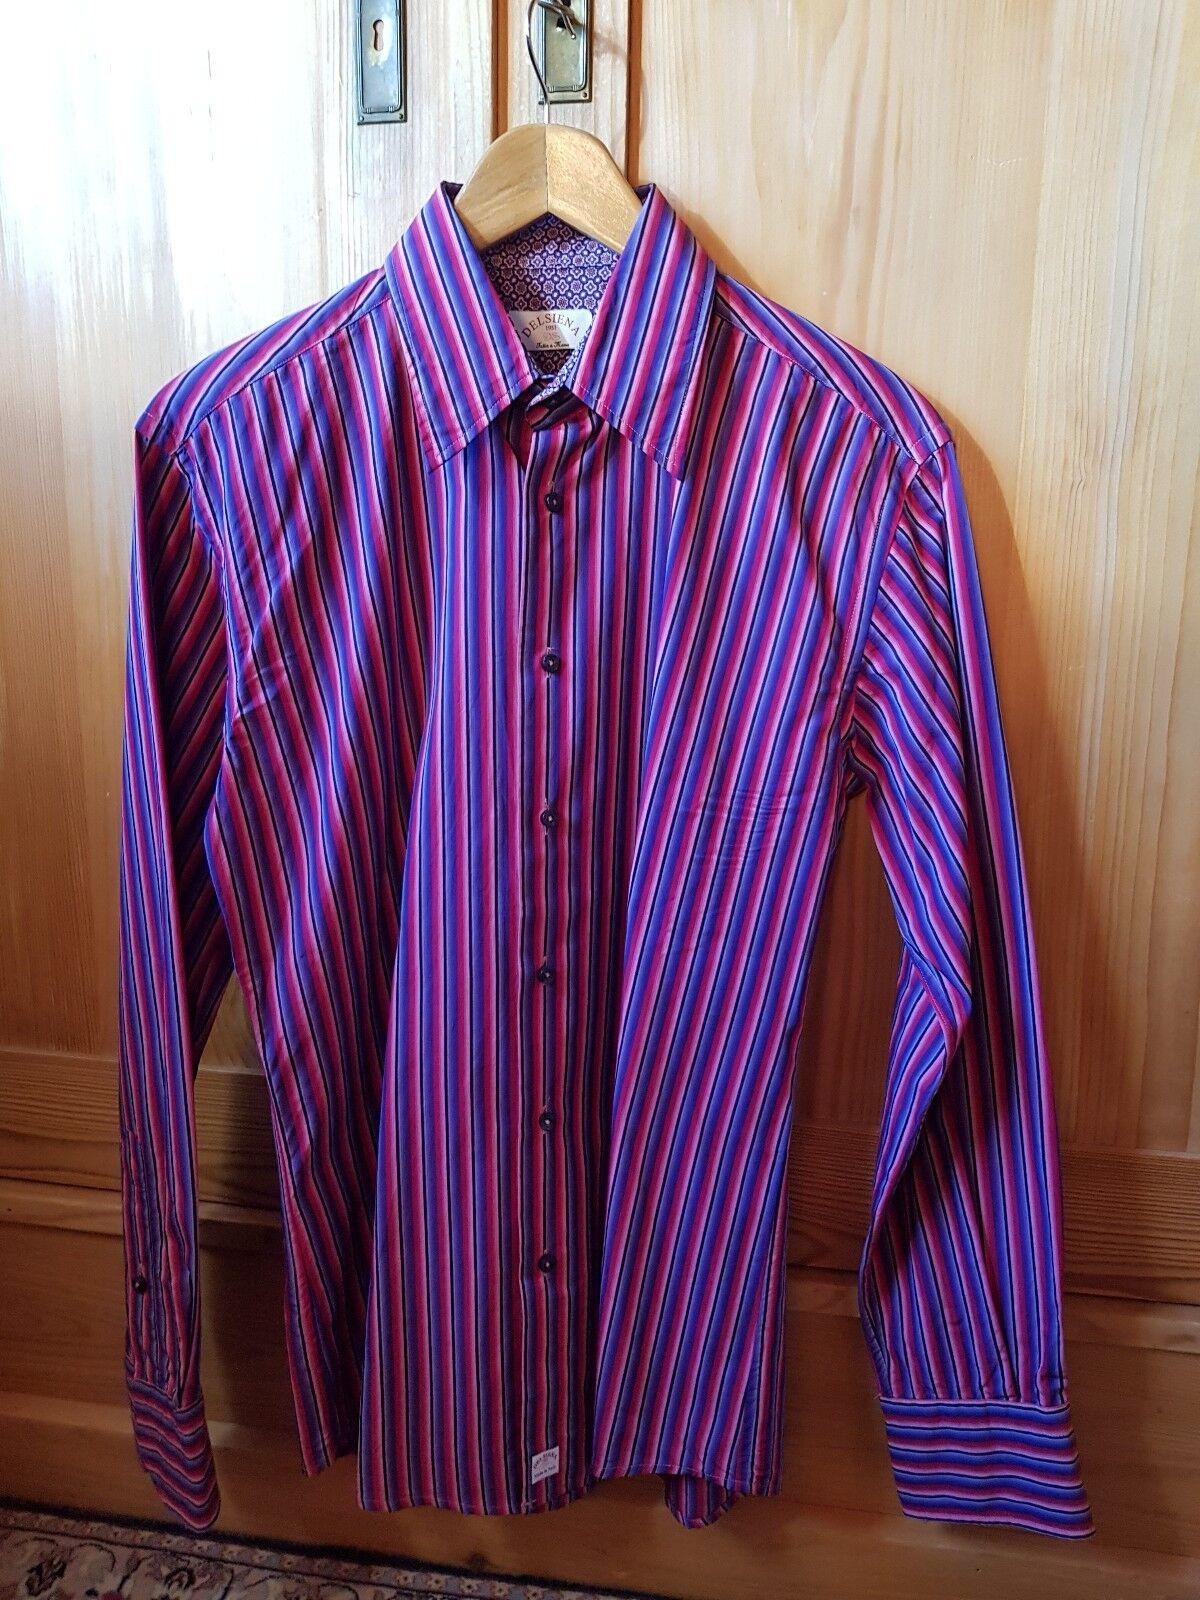 Del Siena Hemd shirt - size 39 (15 1 2) -  stripes pink bluee - slim fit